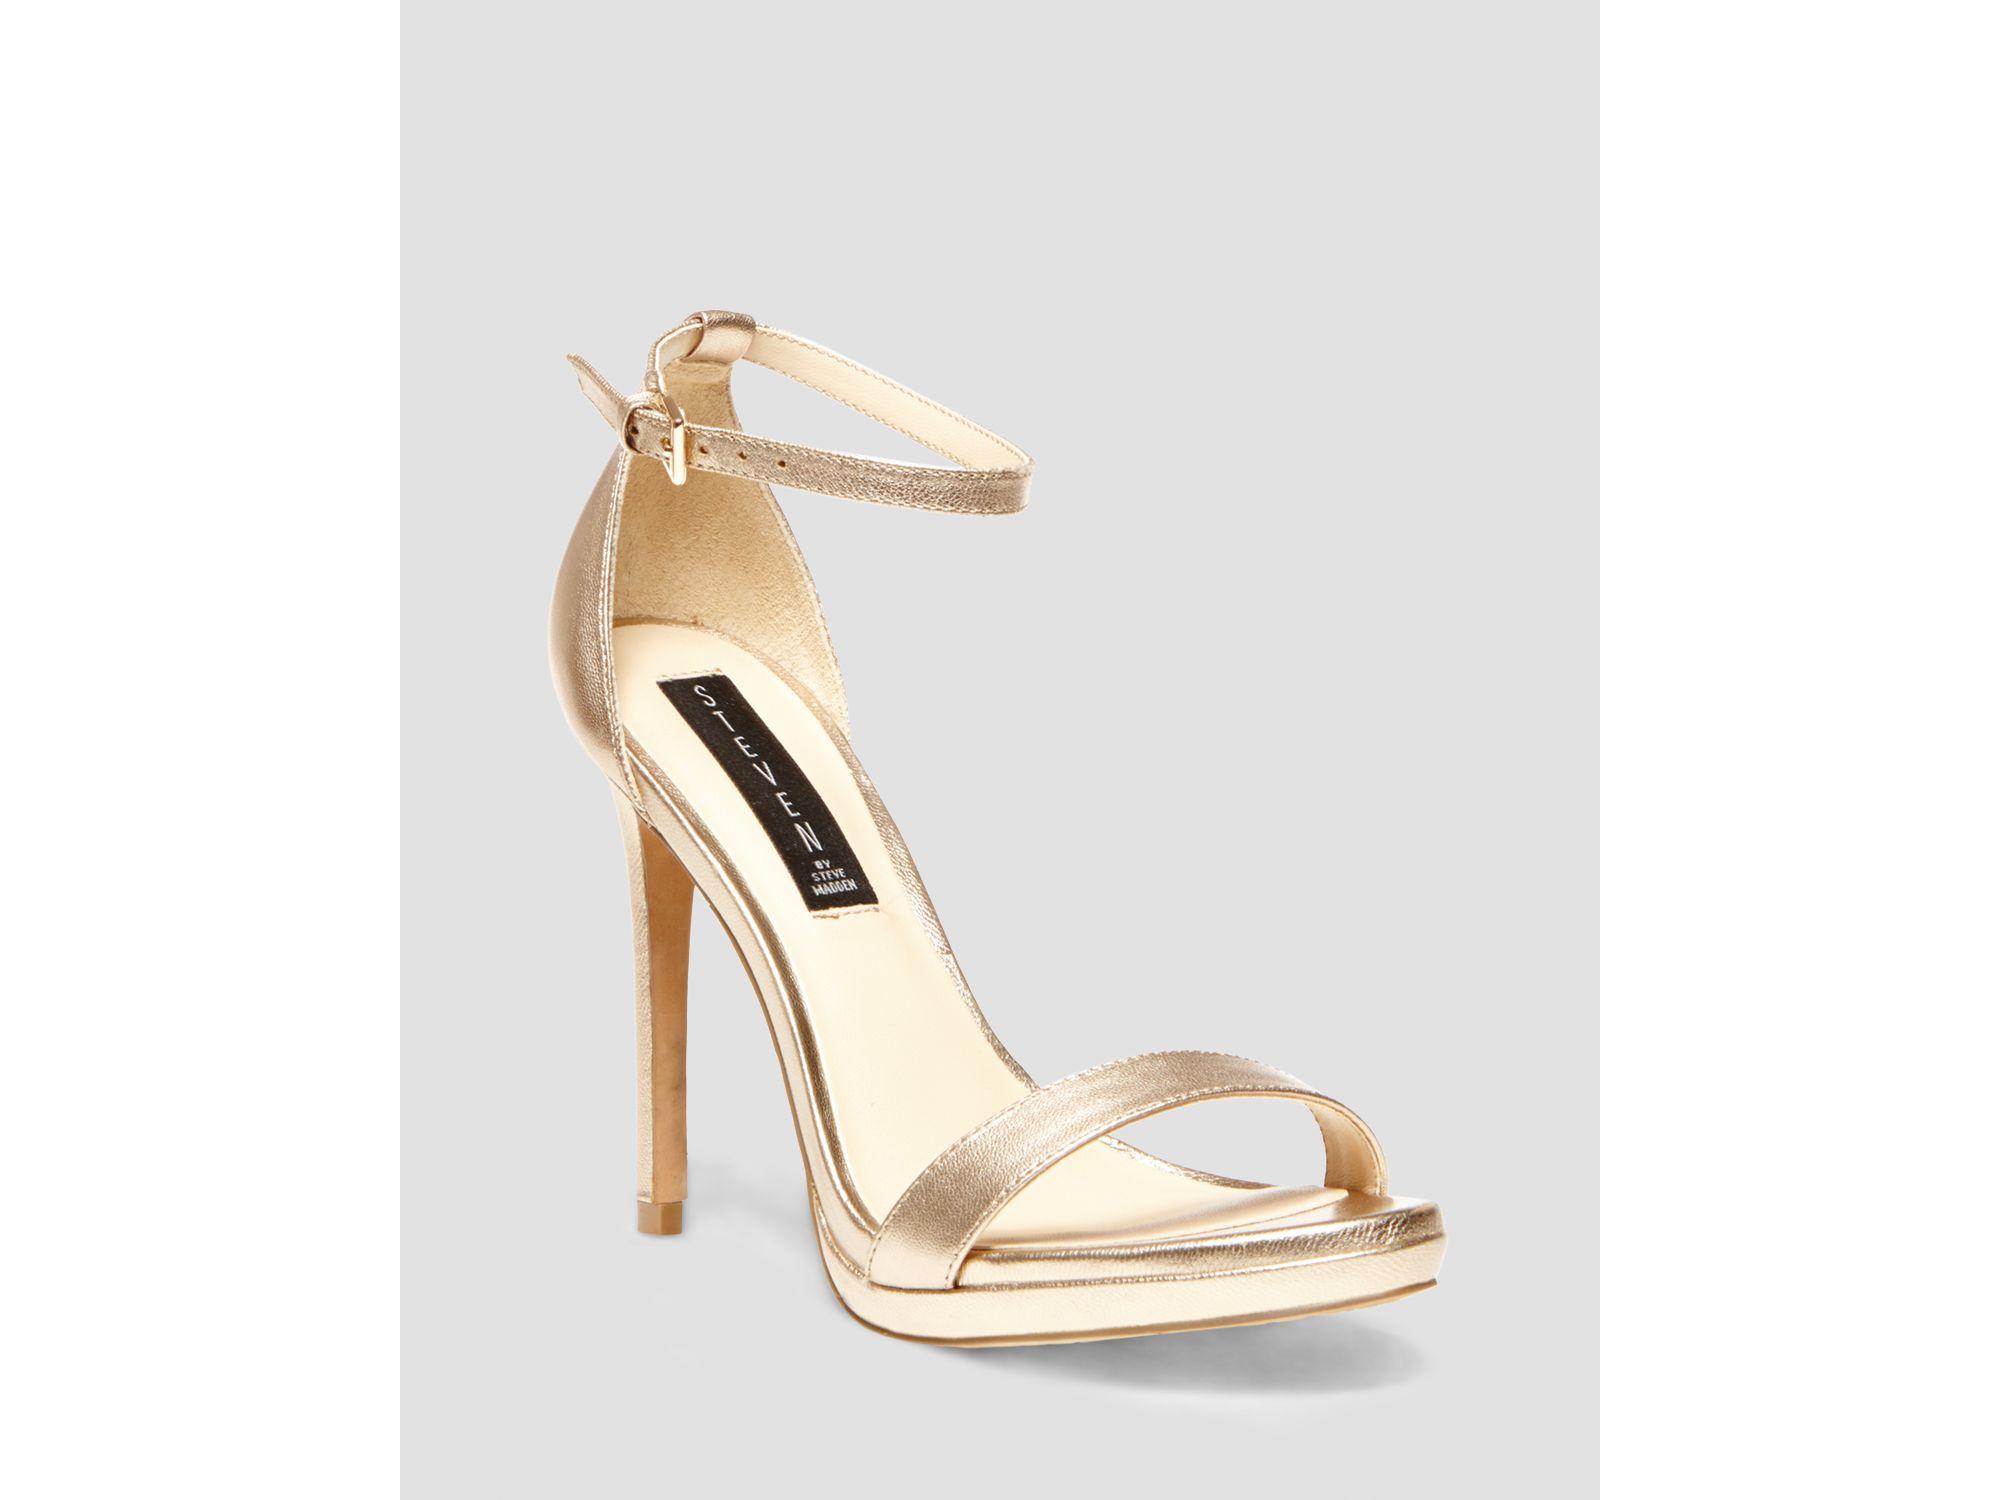 Steven by steve madden Sandals - Rykie Ankle Strap High Heel in ...